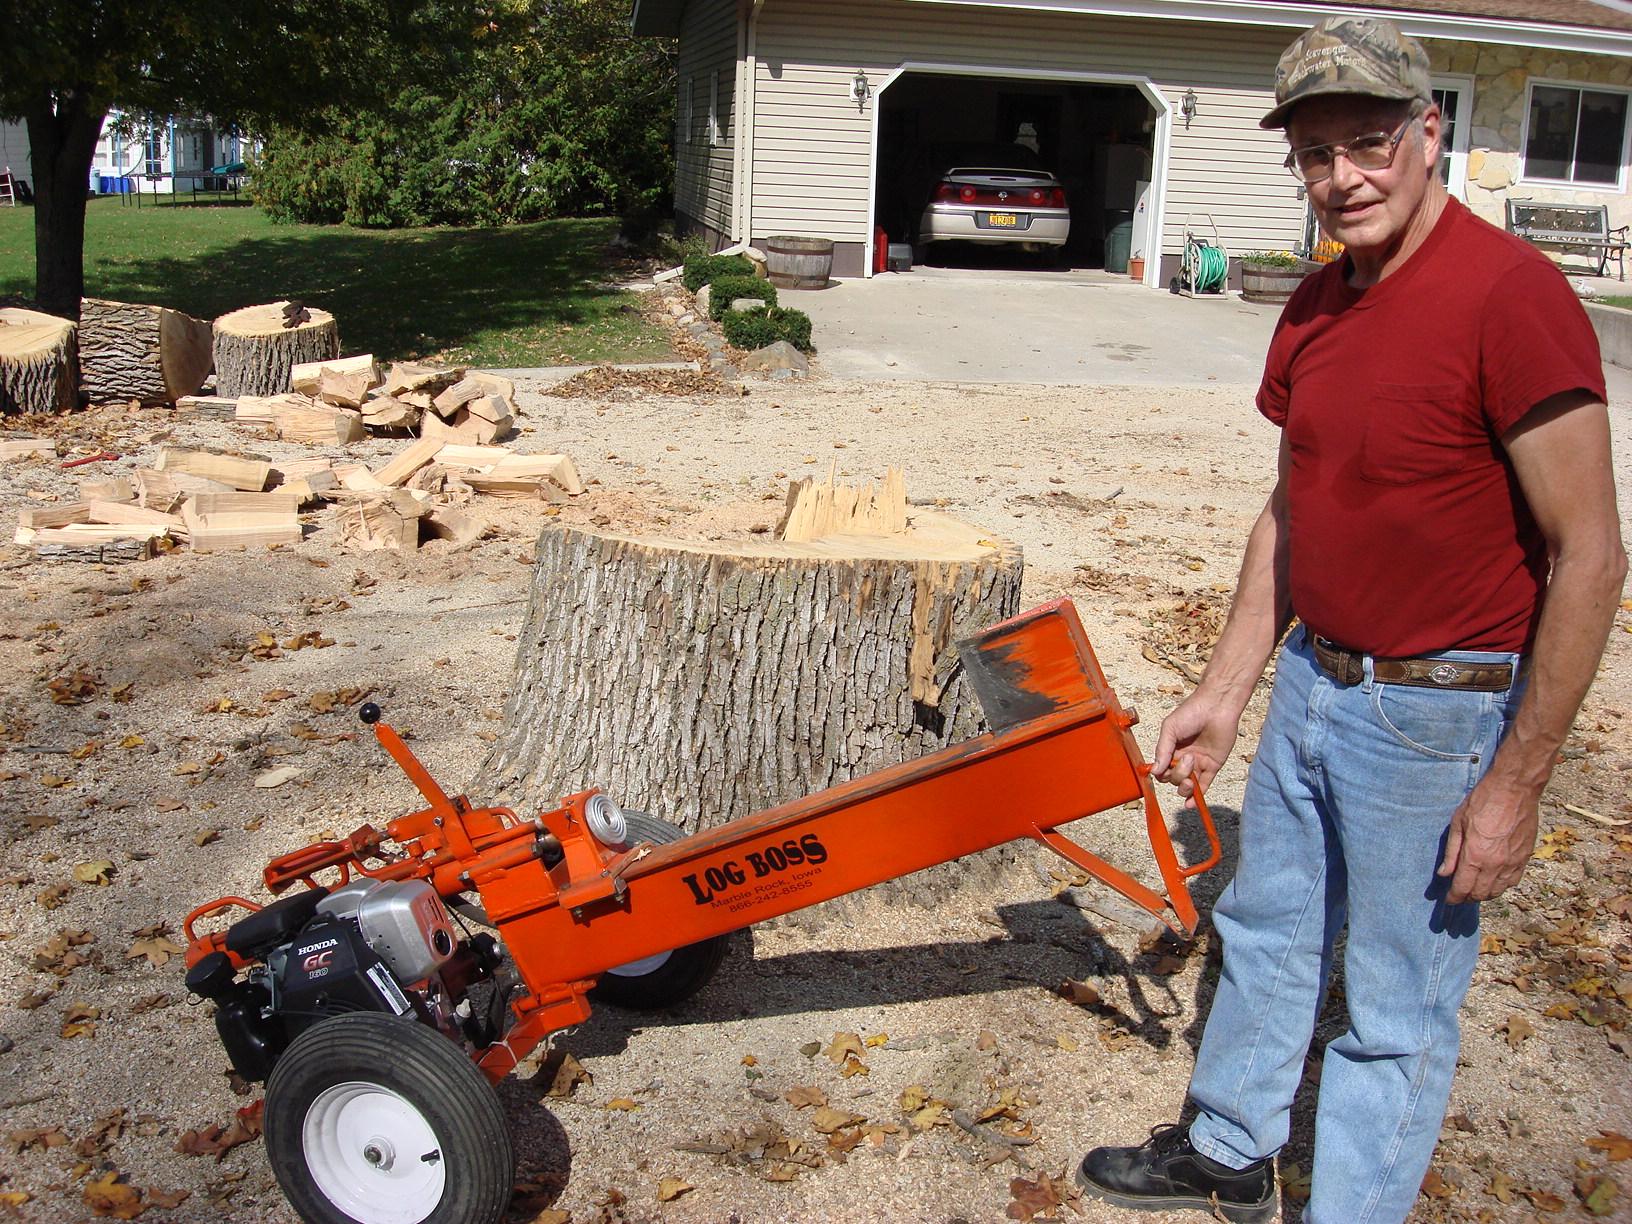 The Logboss Advantage Gas Powered Hydraulic Wood